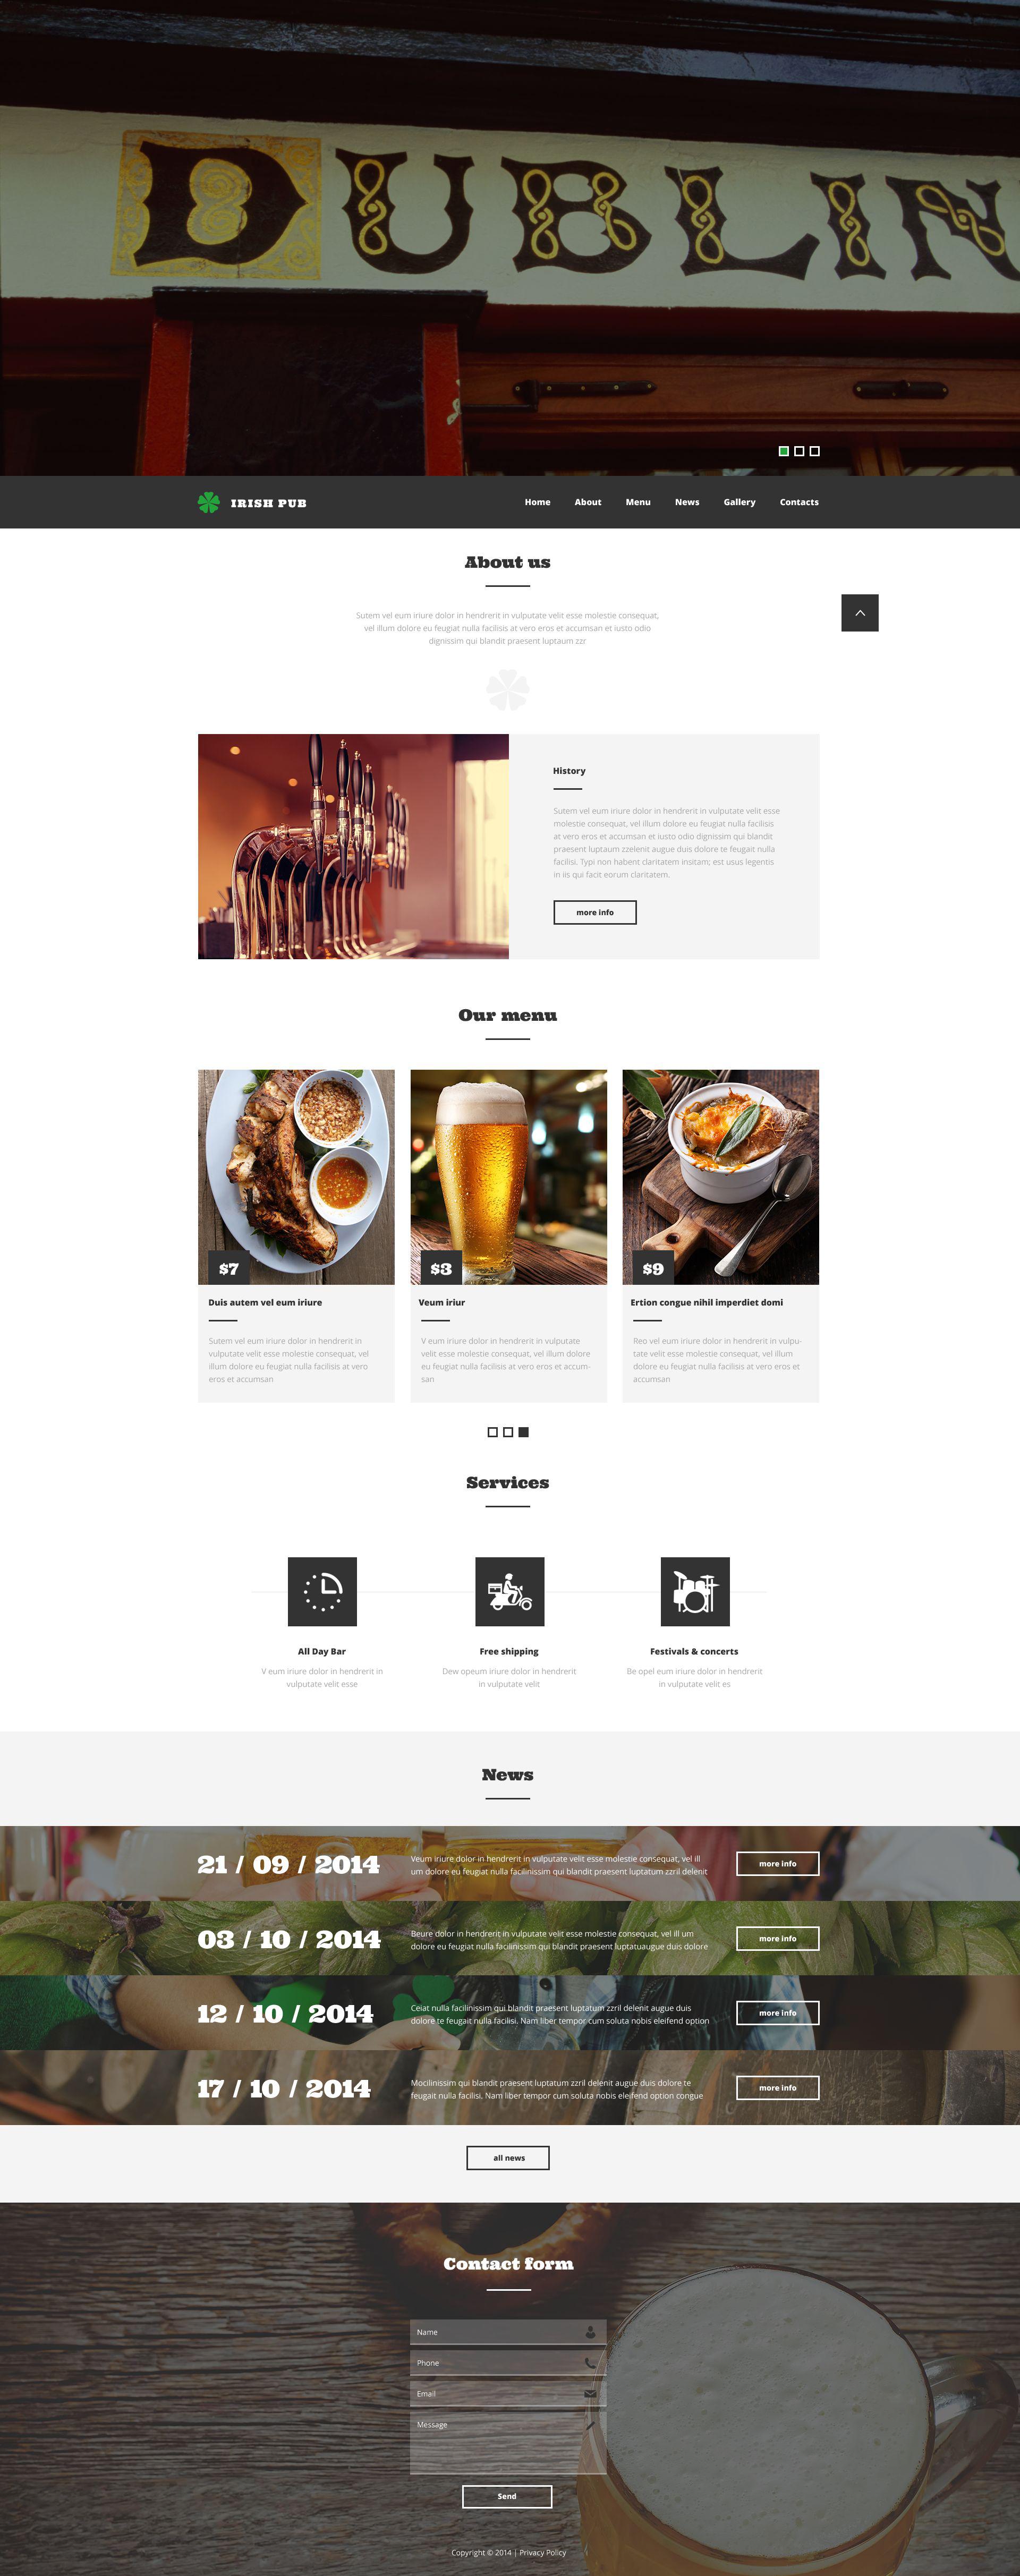 Großartig Nagelstudio Website Vorlage Fotos - Entry Level Resume ...